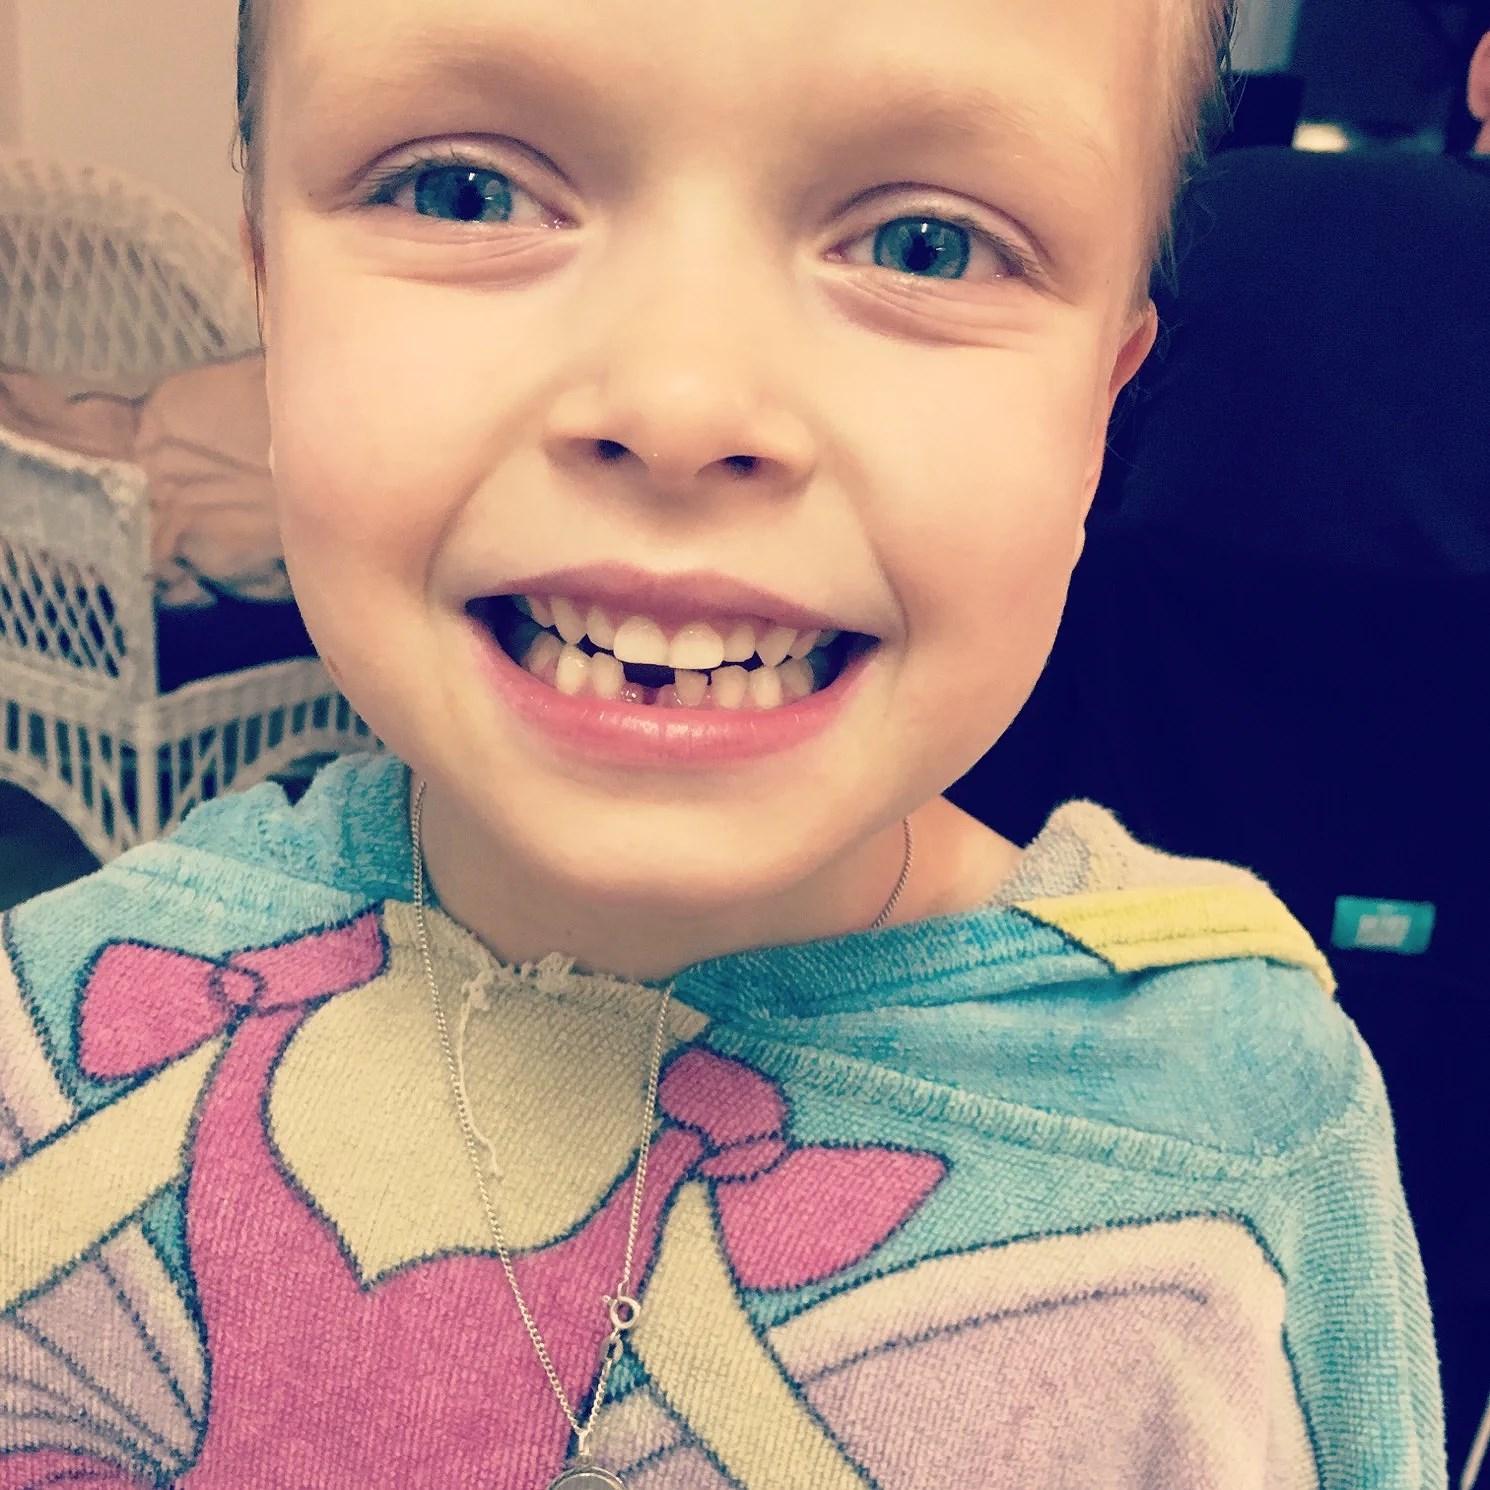 Tappat tand